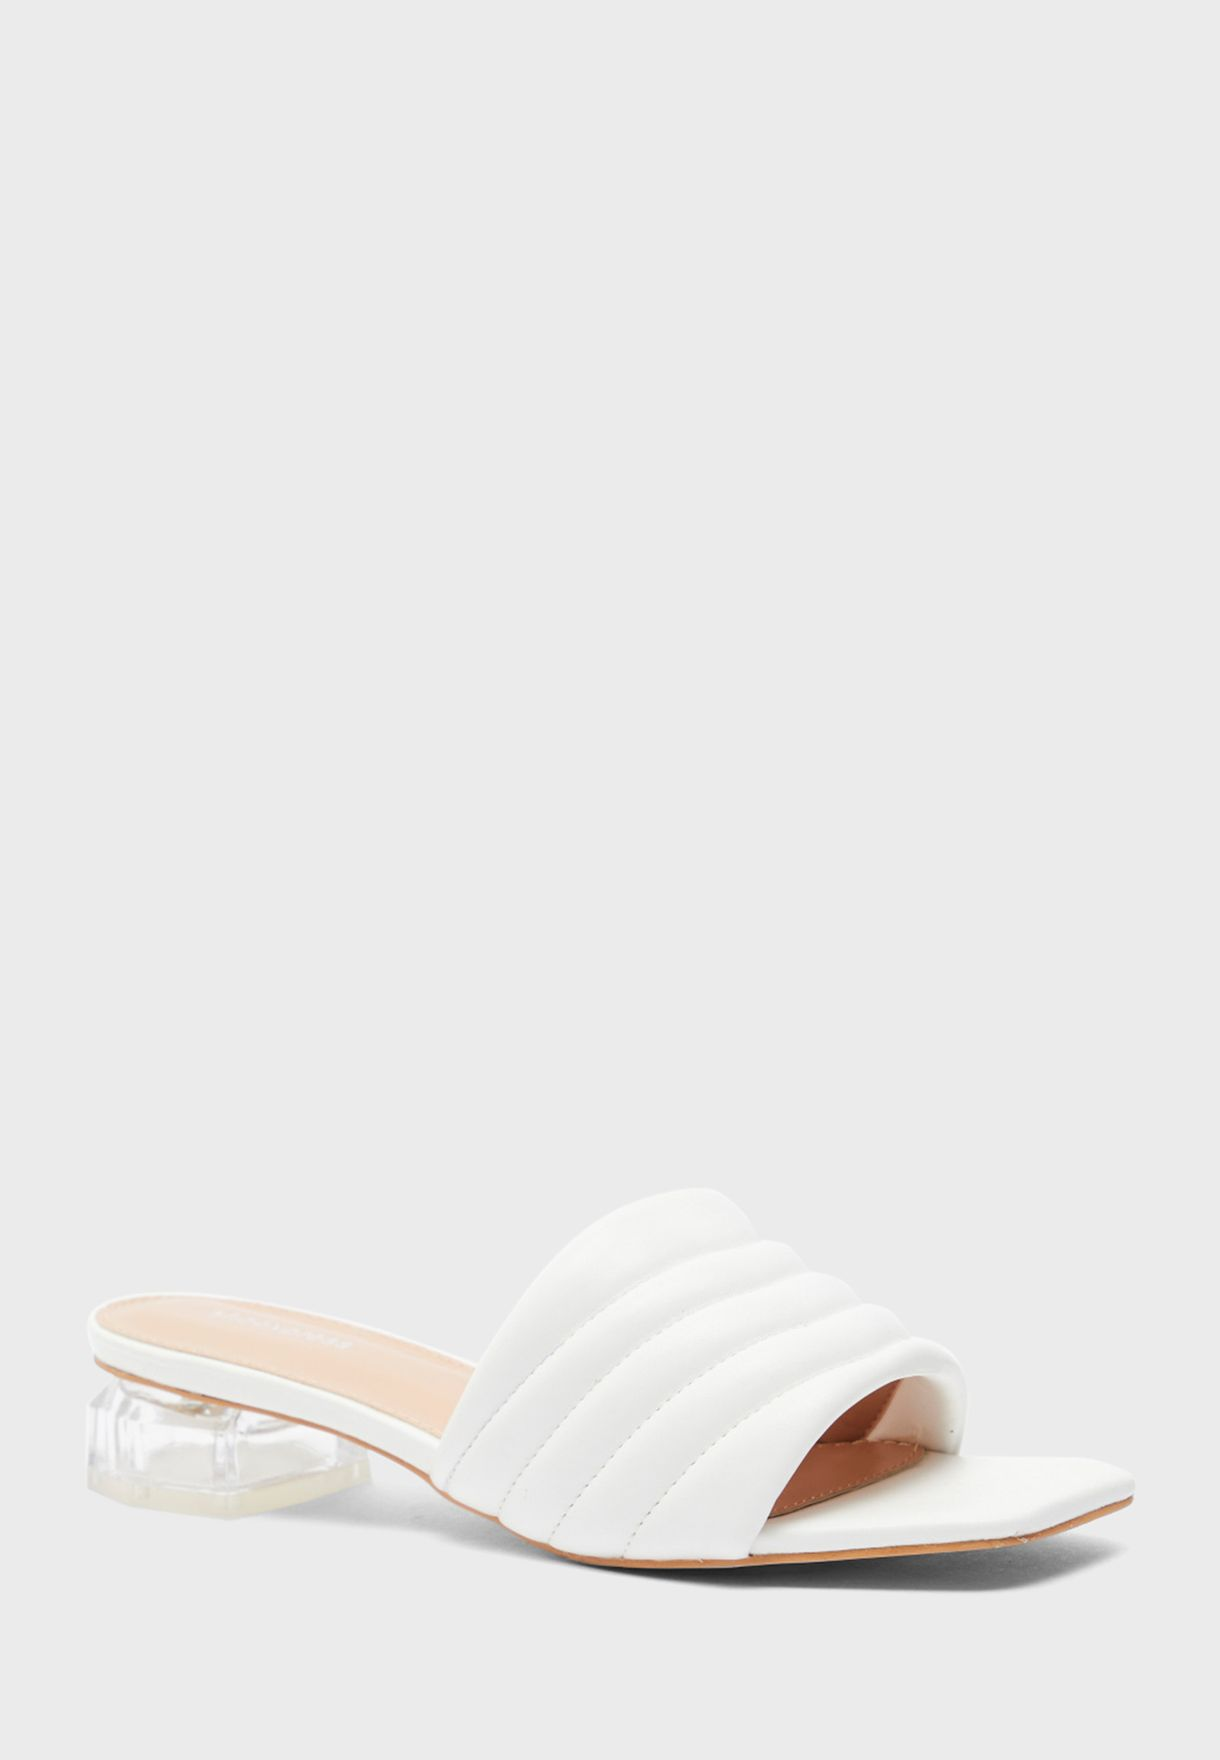 Wide Strap Mid Heel Sandals